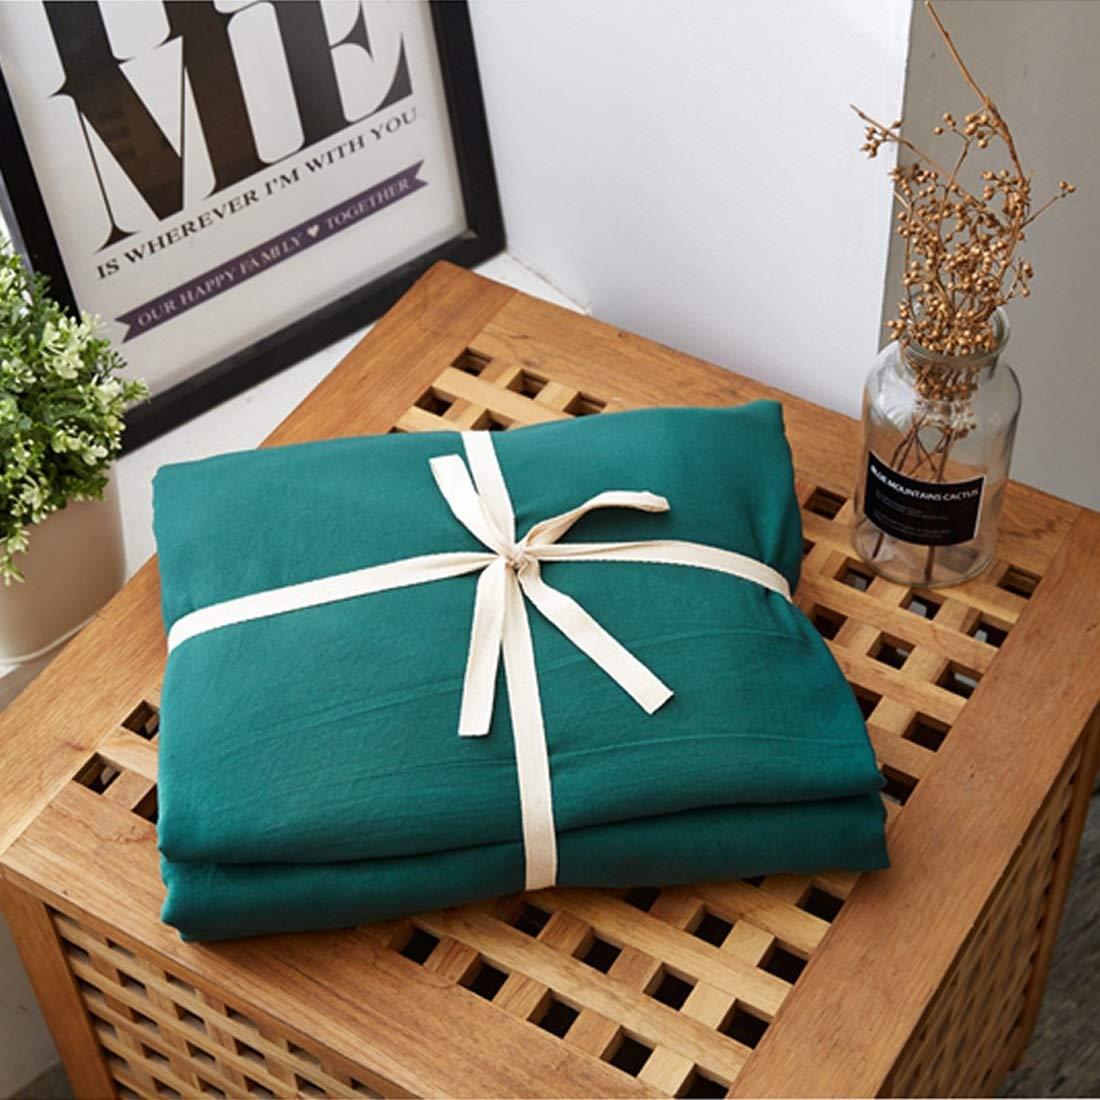 Keriya Sende 4セットのベッド寝具セット 綿 高級 ベッドリネン枕カバー インテリアに適し 掛け布団カバー 洗える 抗菌 防臭 寝具カバーセット (色 : オレンジ, サイズ : 180*220CM) B07T61XLJQ